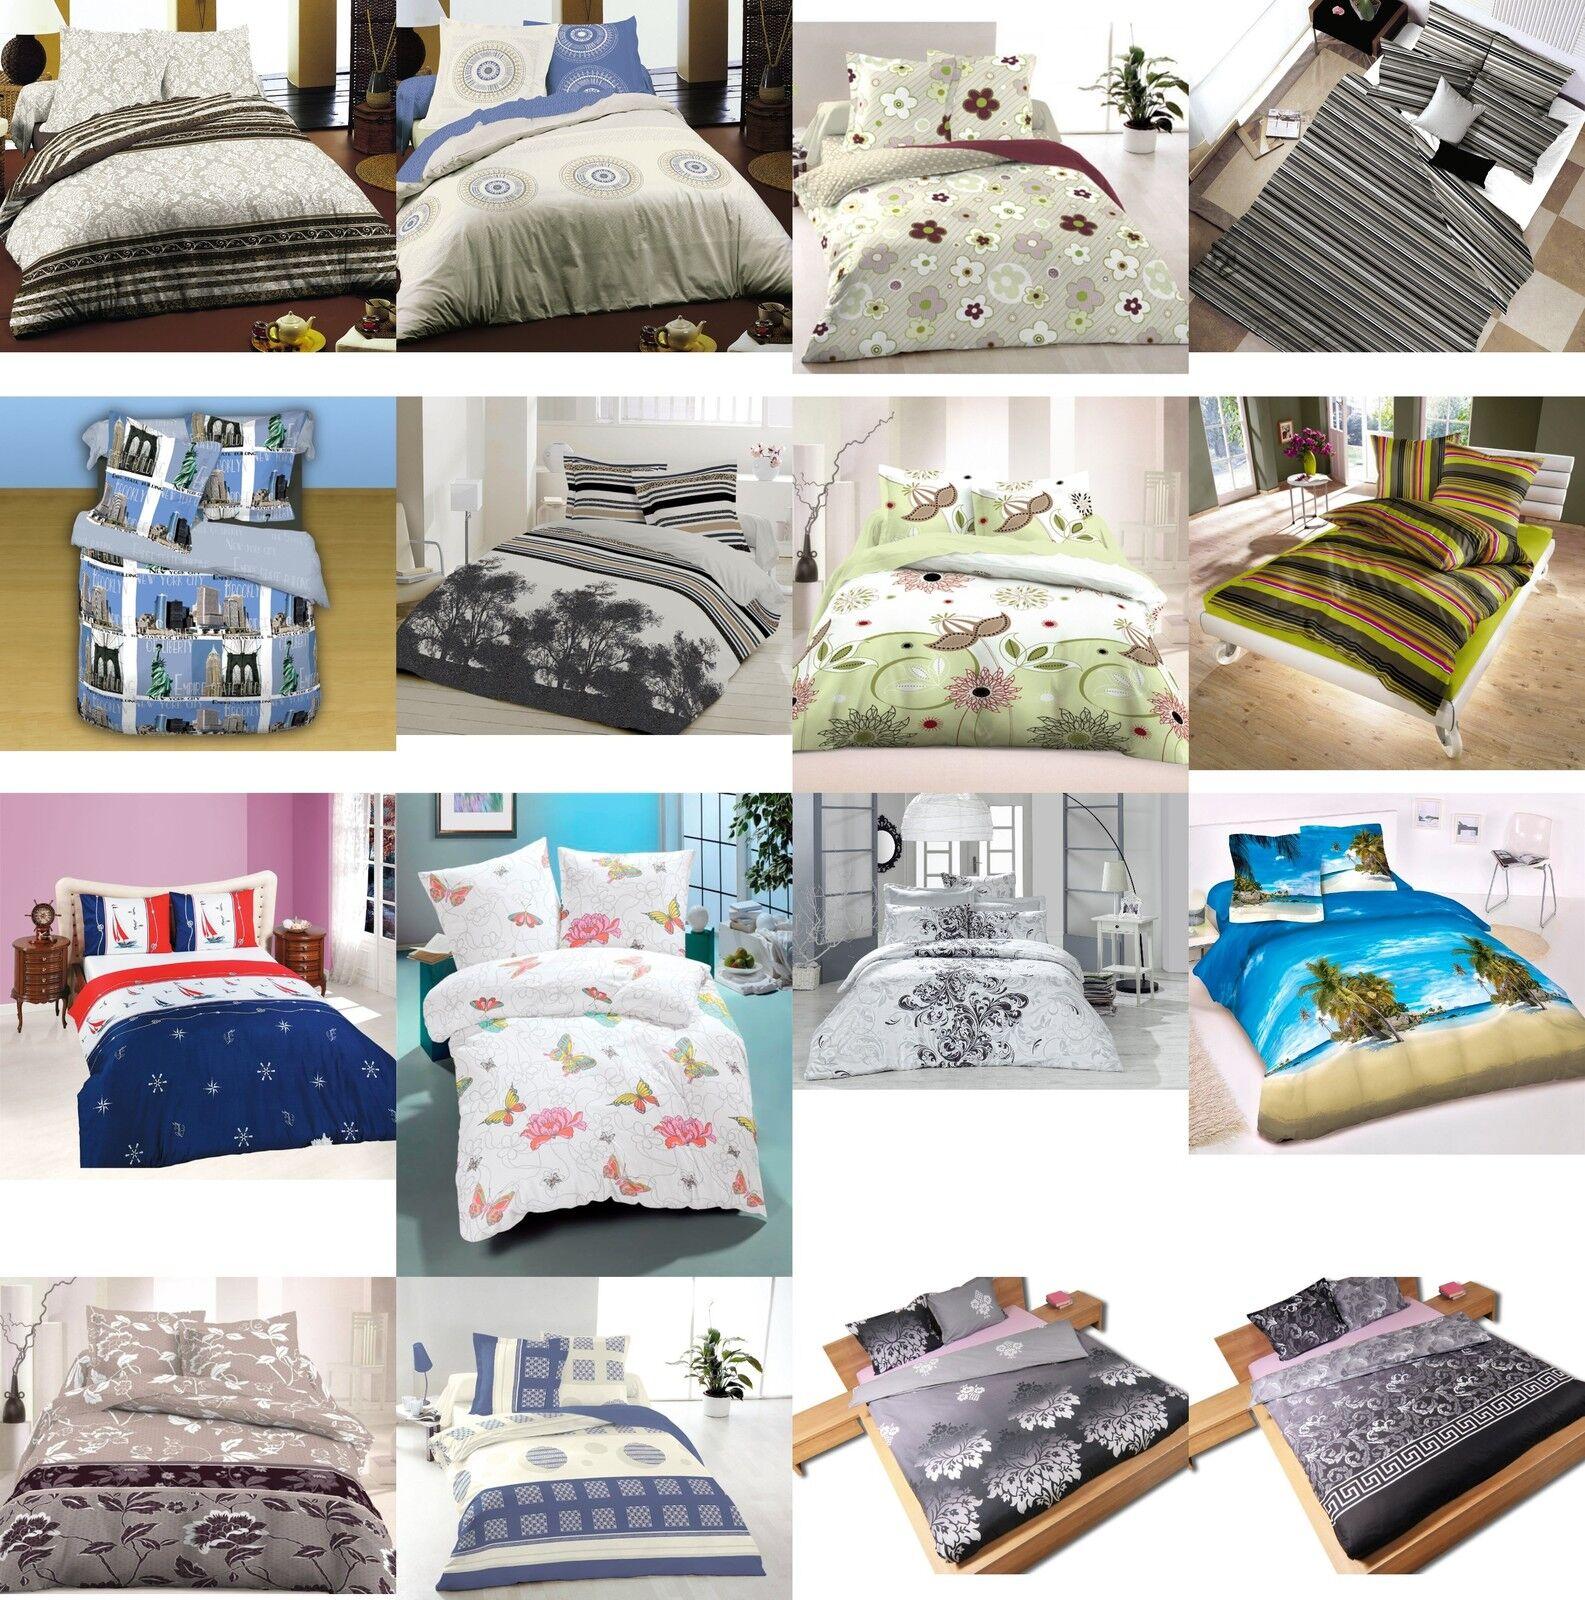 ThreeL 100% Cotton Bedding set Bed Linen Duvet Cover set